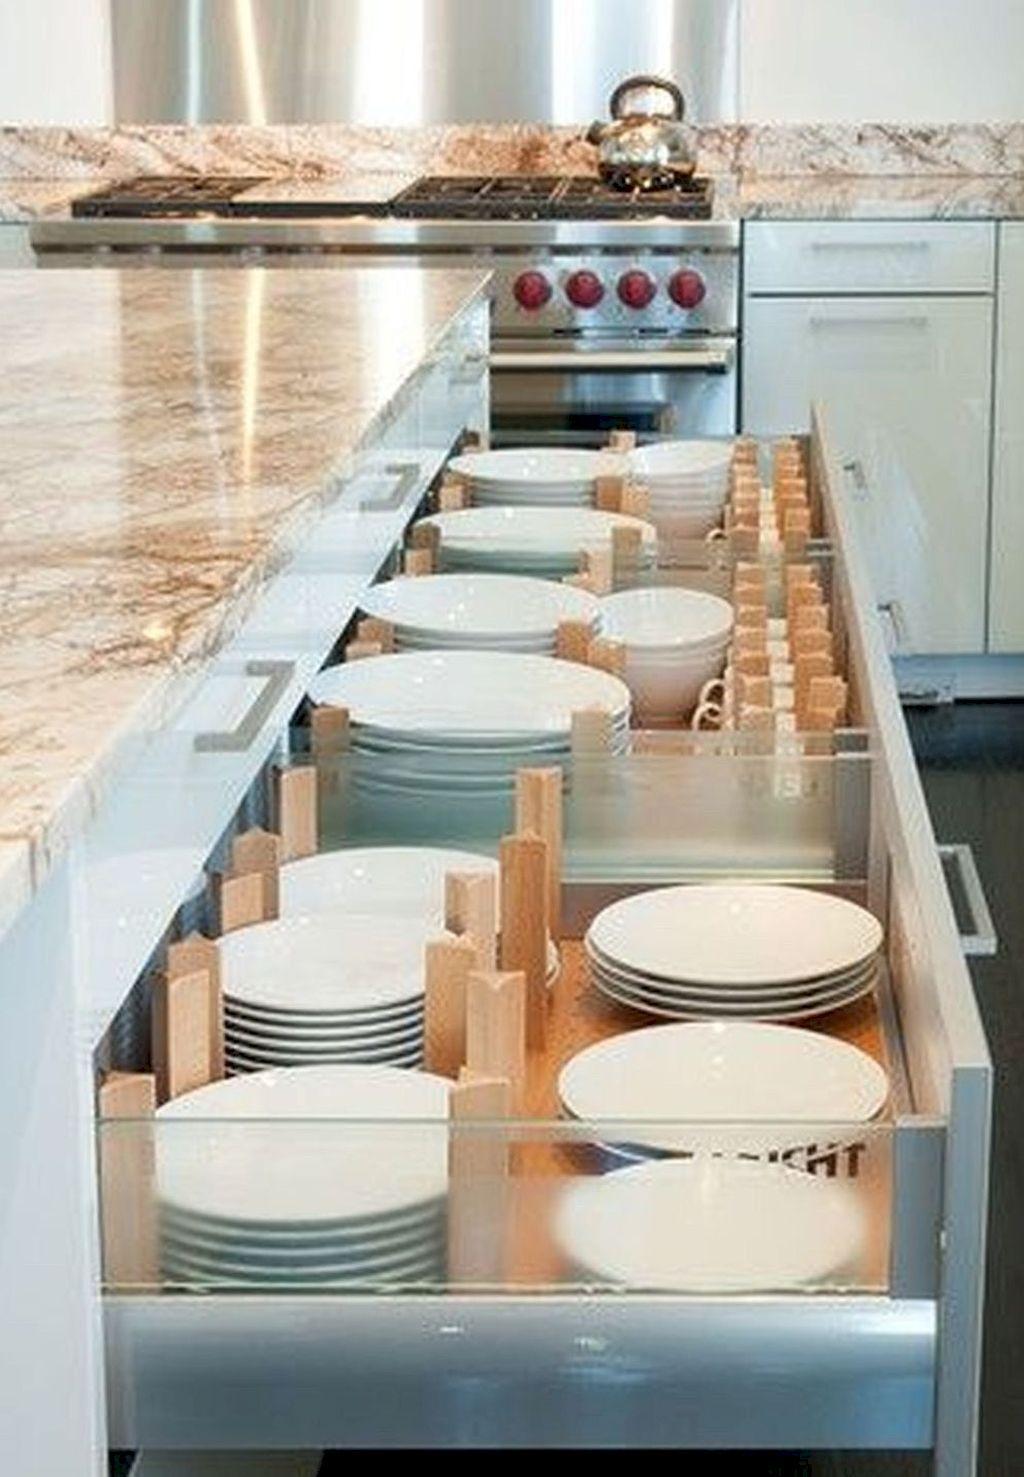 Ideas for kitchen decor  Awesome  Smart Small Kitchen Organization Decor Ideas